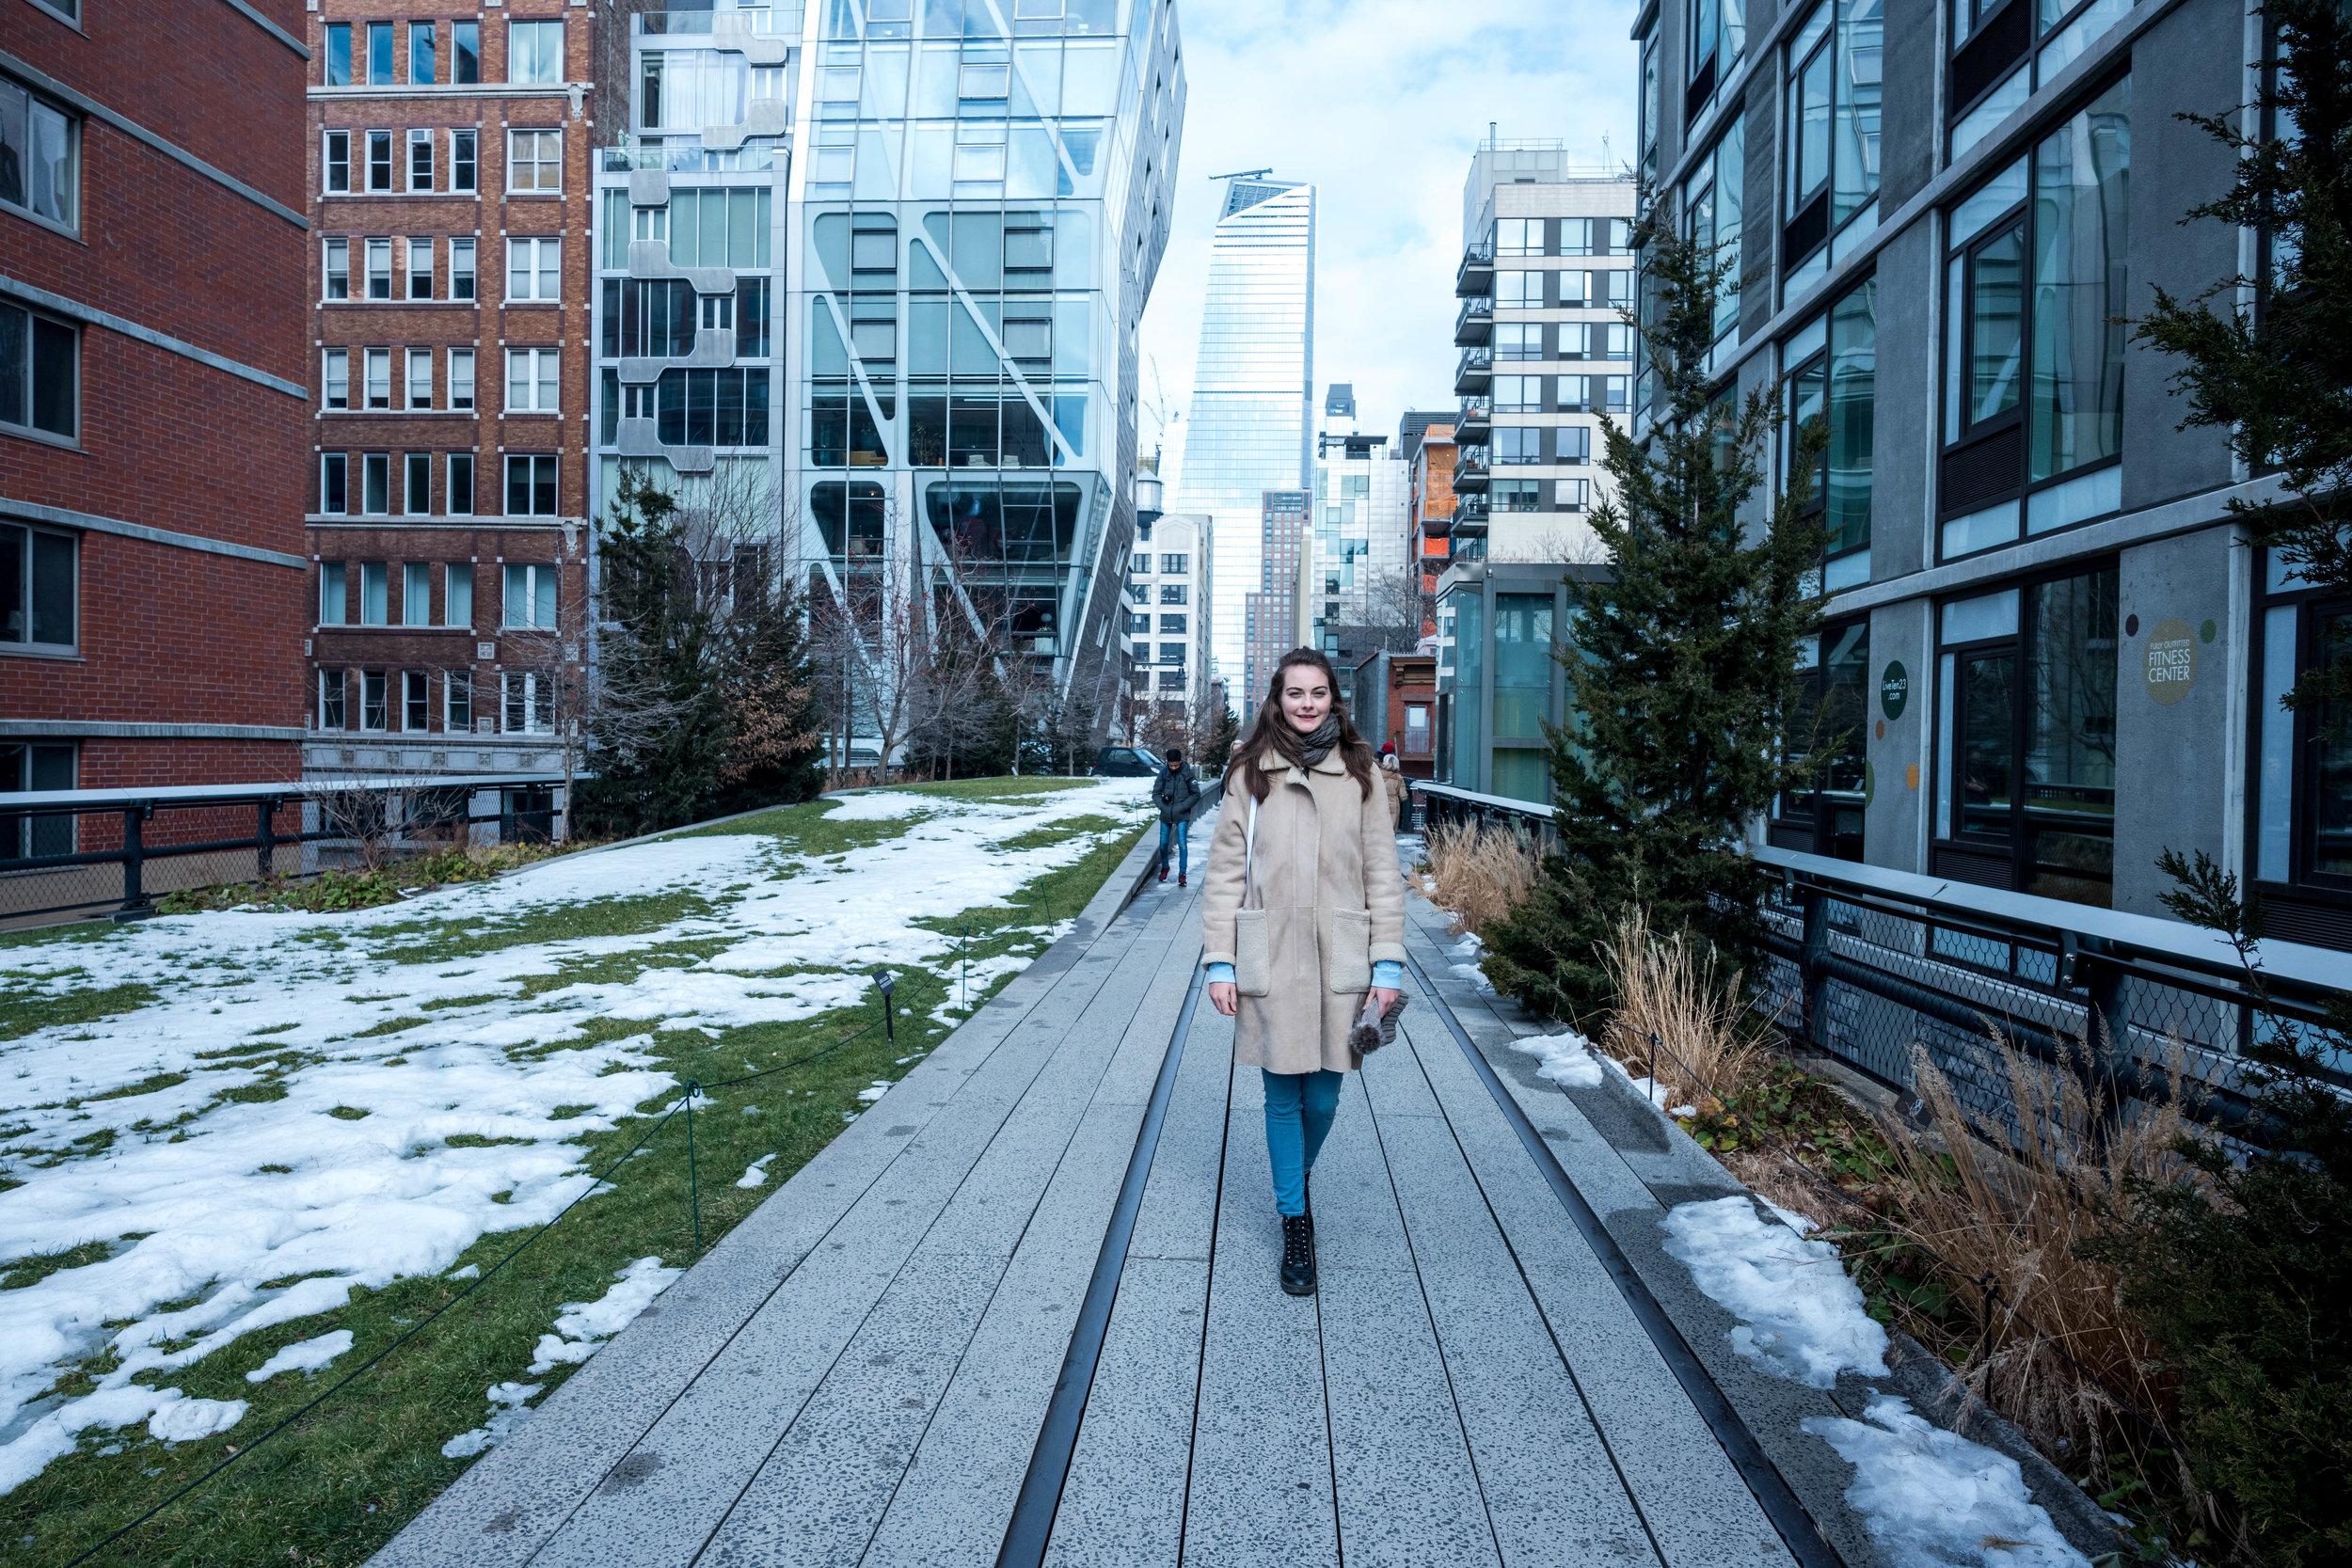 Leica SL + 21mm f/1.4 Summilux - On the High Line